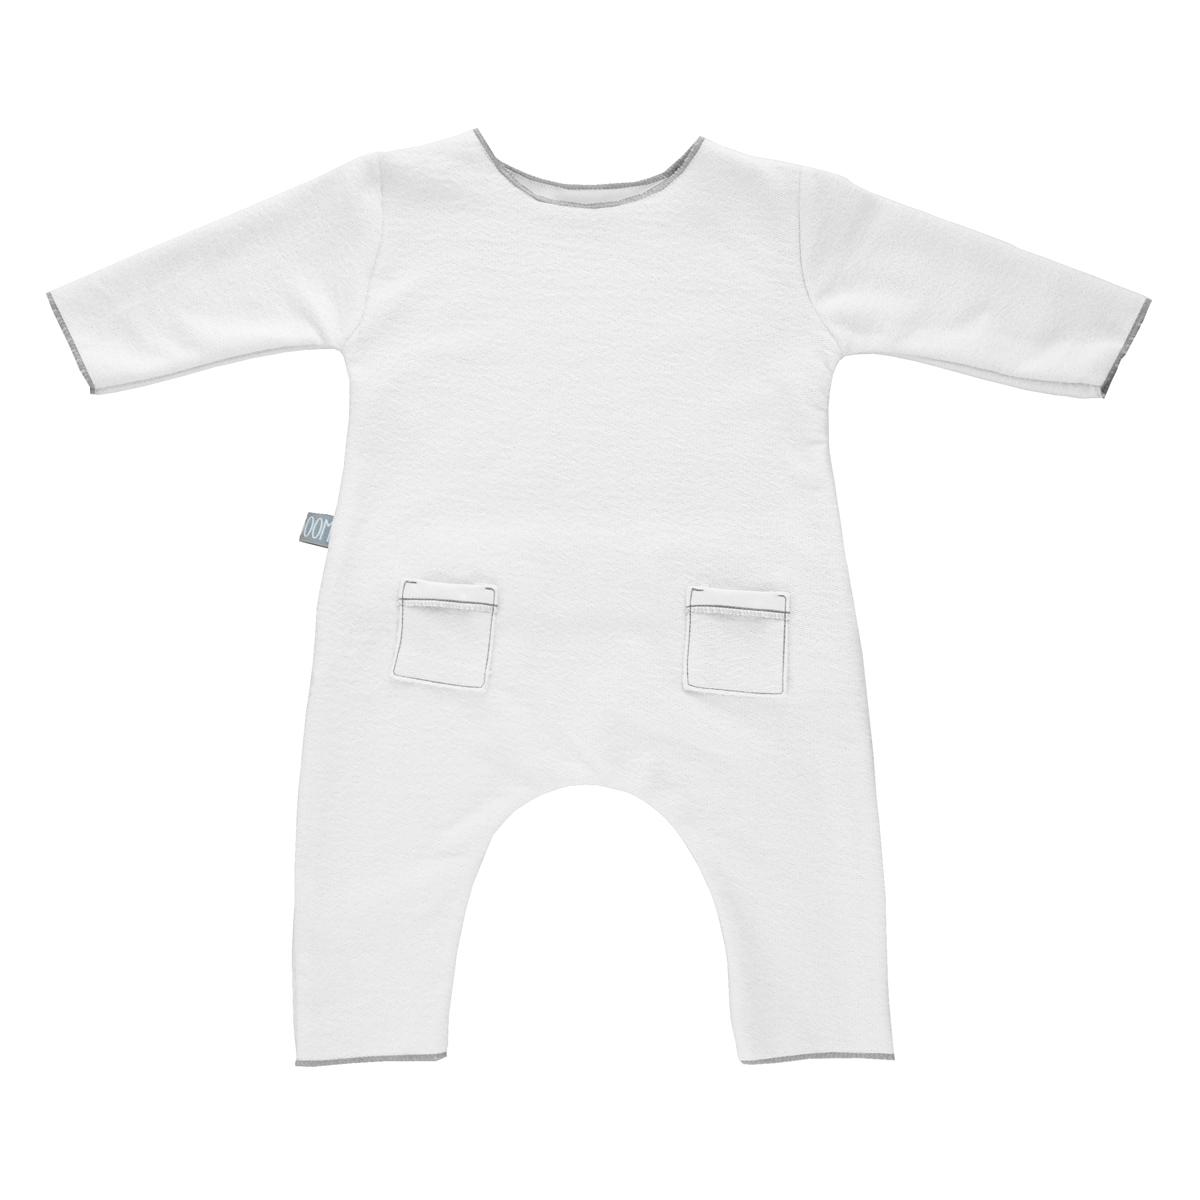 Robe & combinaison Combinaison Blanc - 1 Mois Combinaison Blanc - 1 Mois